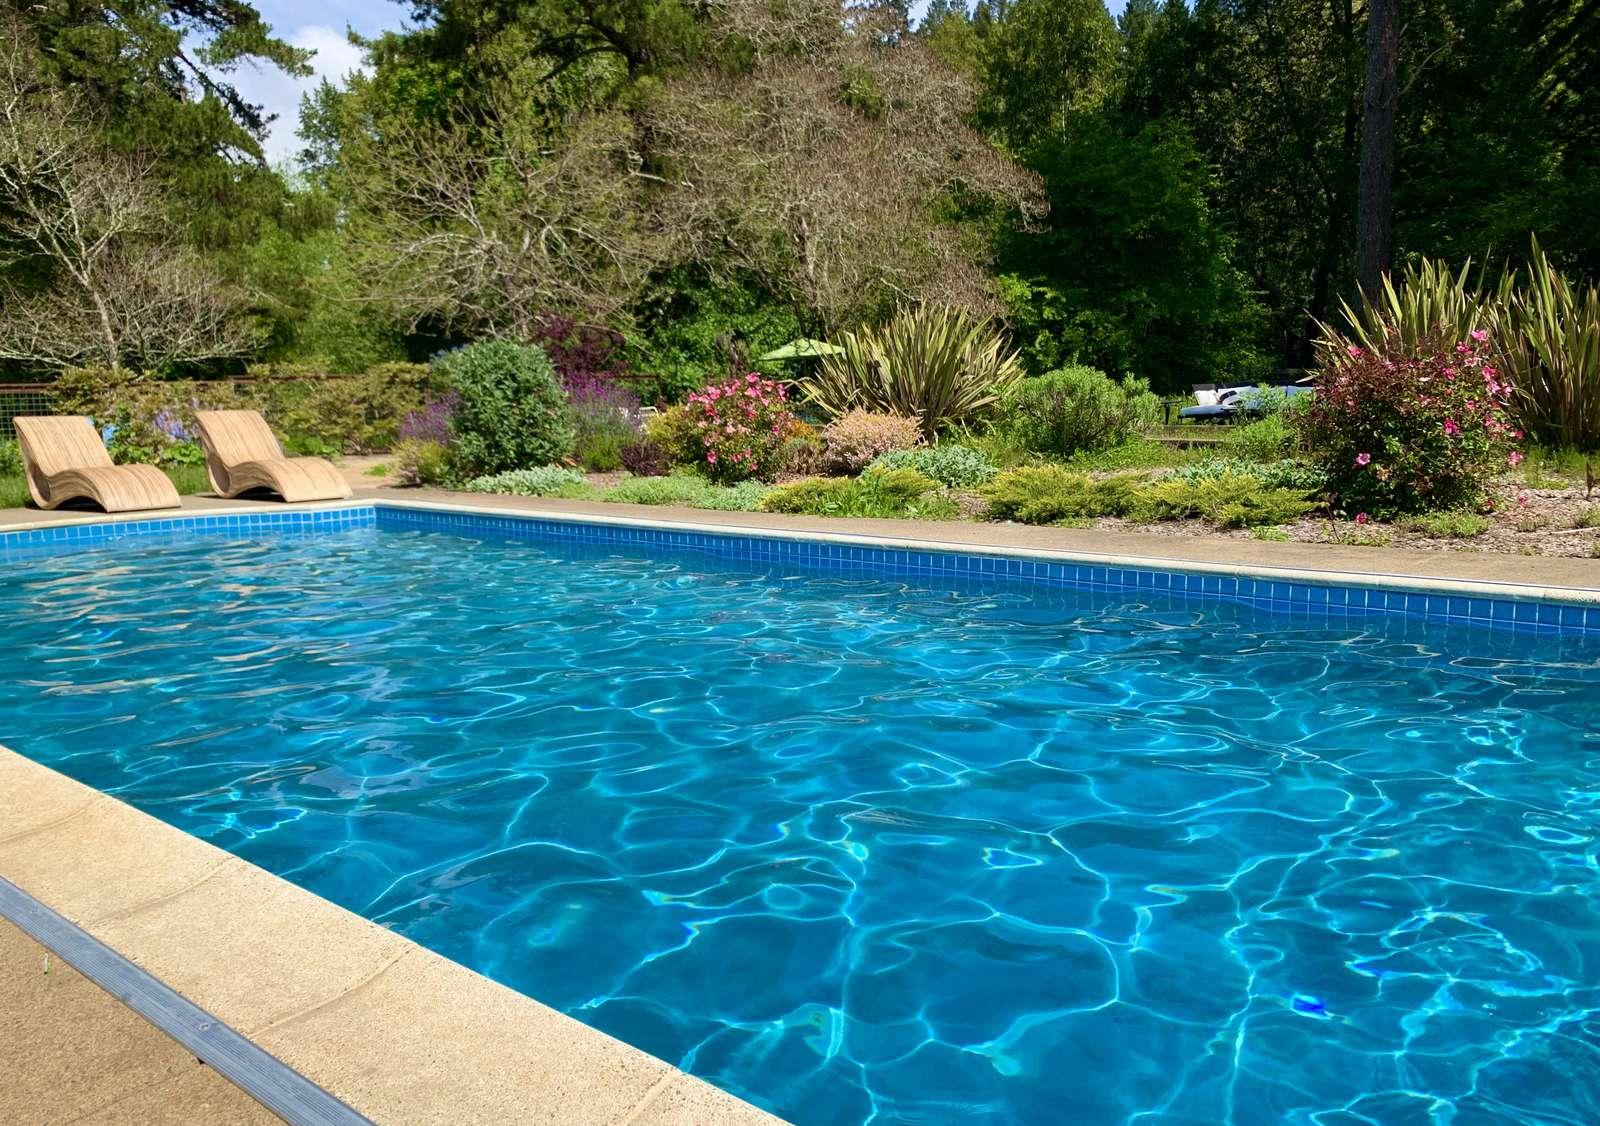 Refreshing pool the kids will love!